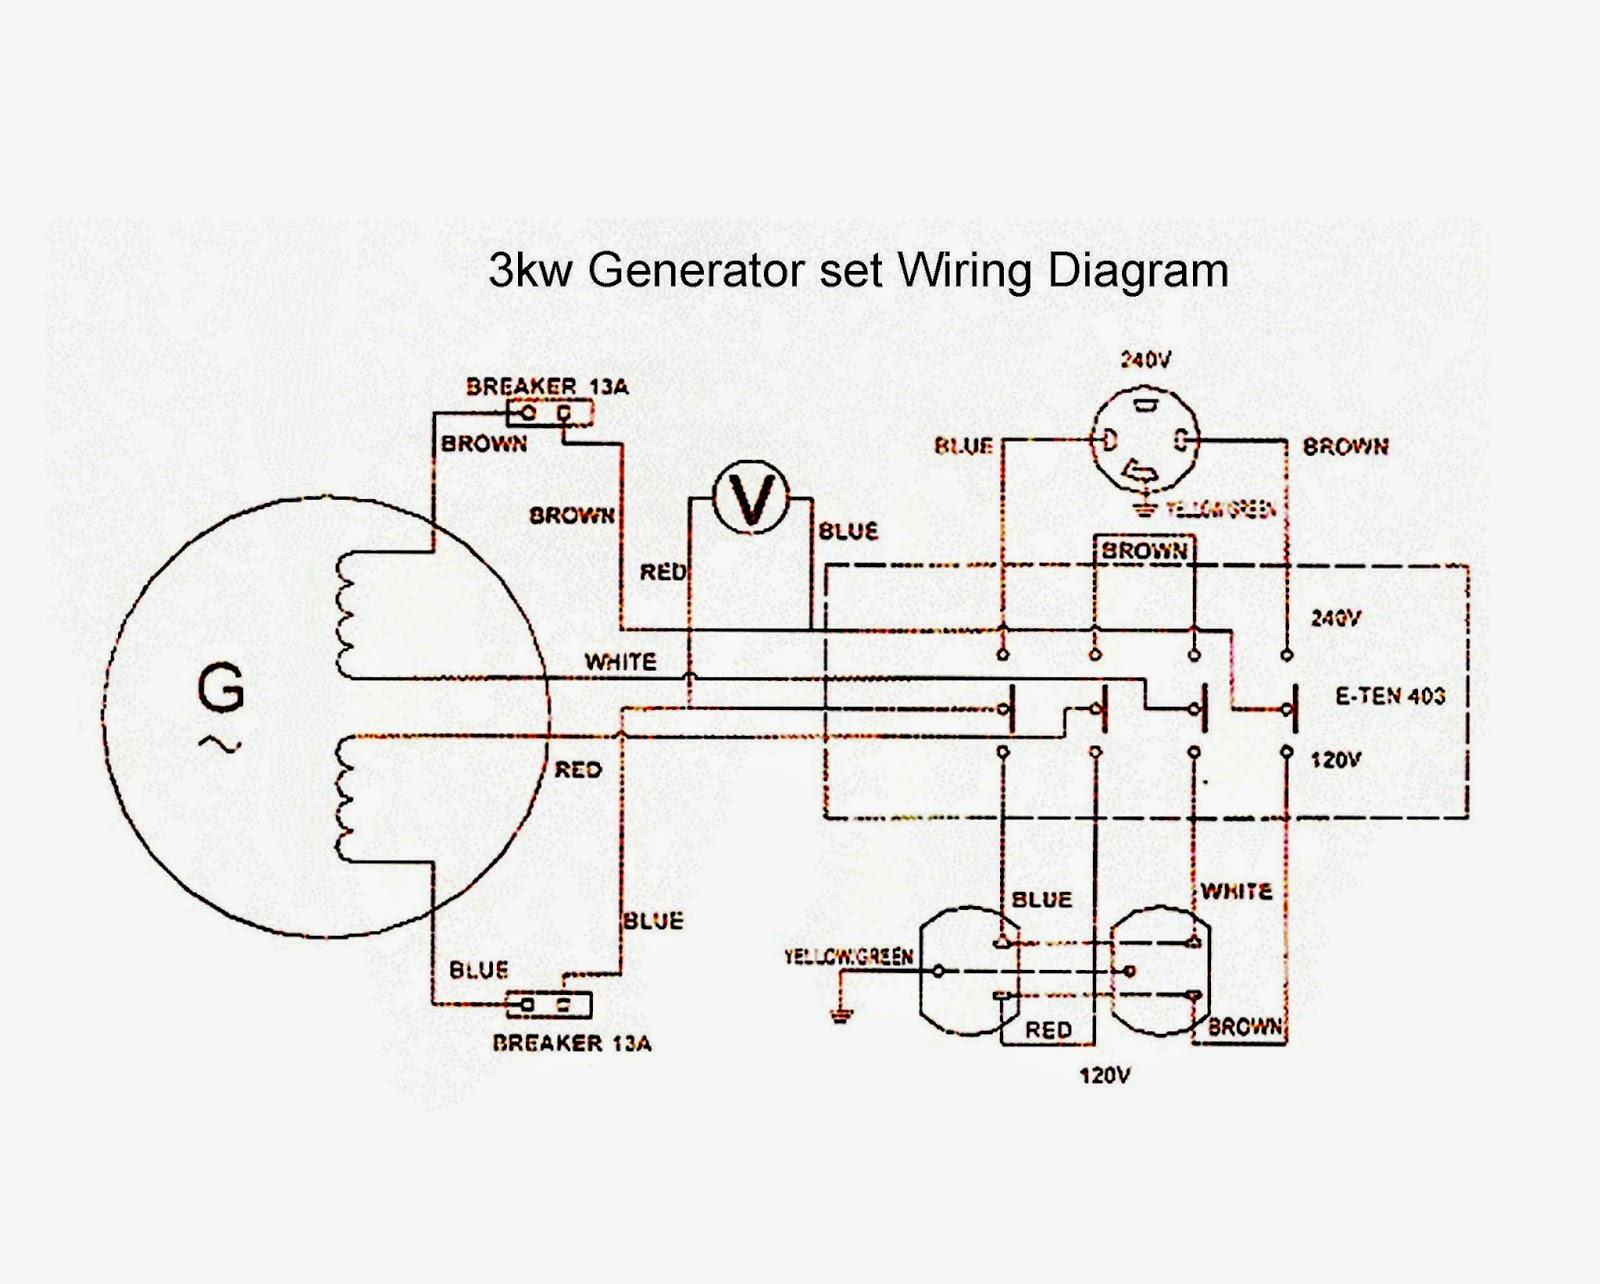 Automotive Wiring Diagram Maker On Automotive Images Free